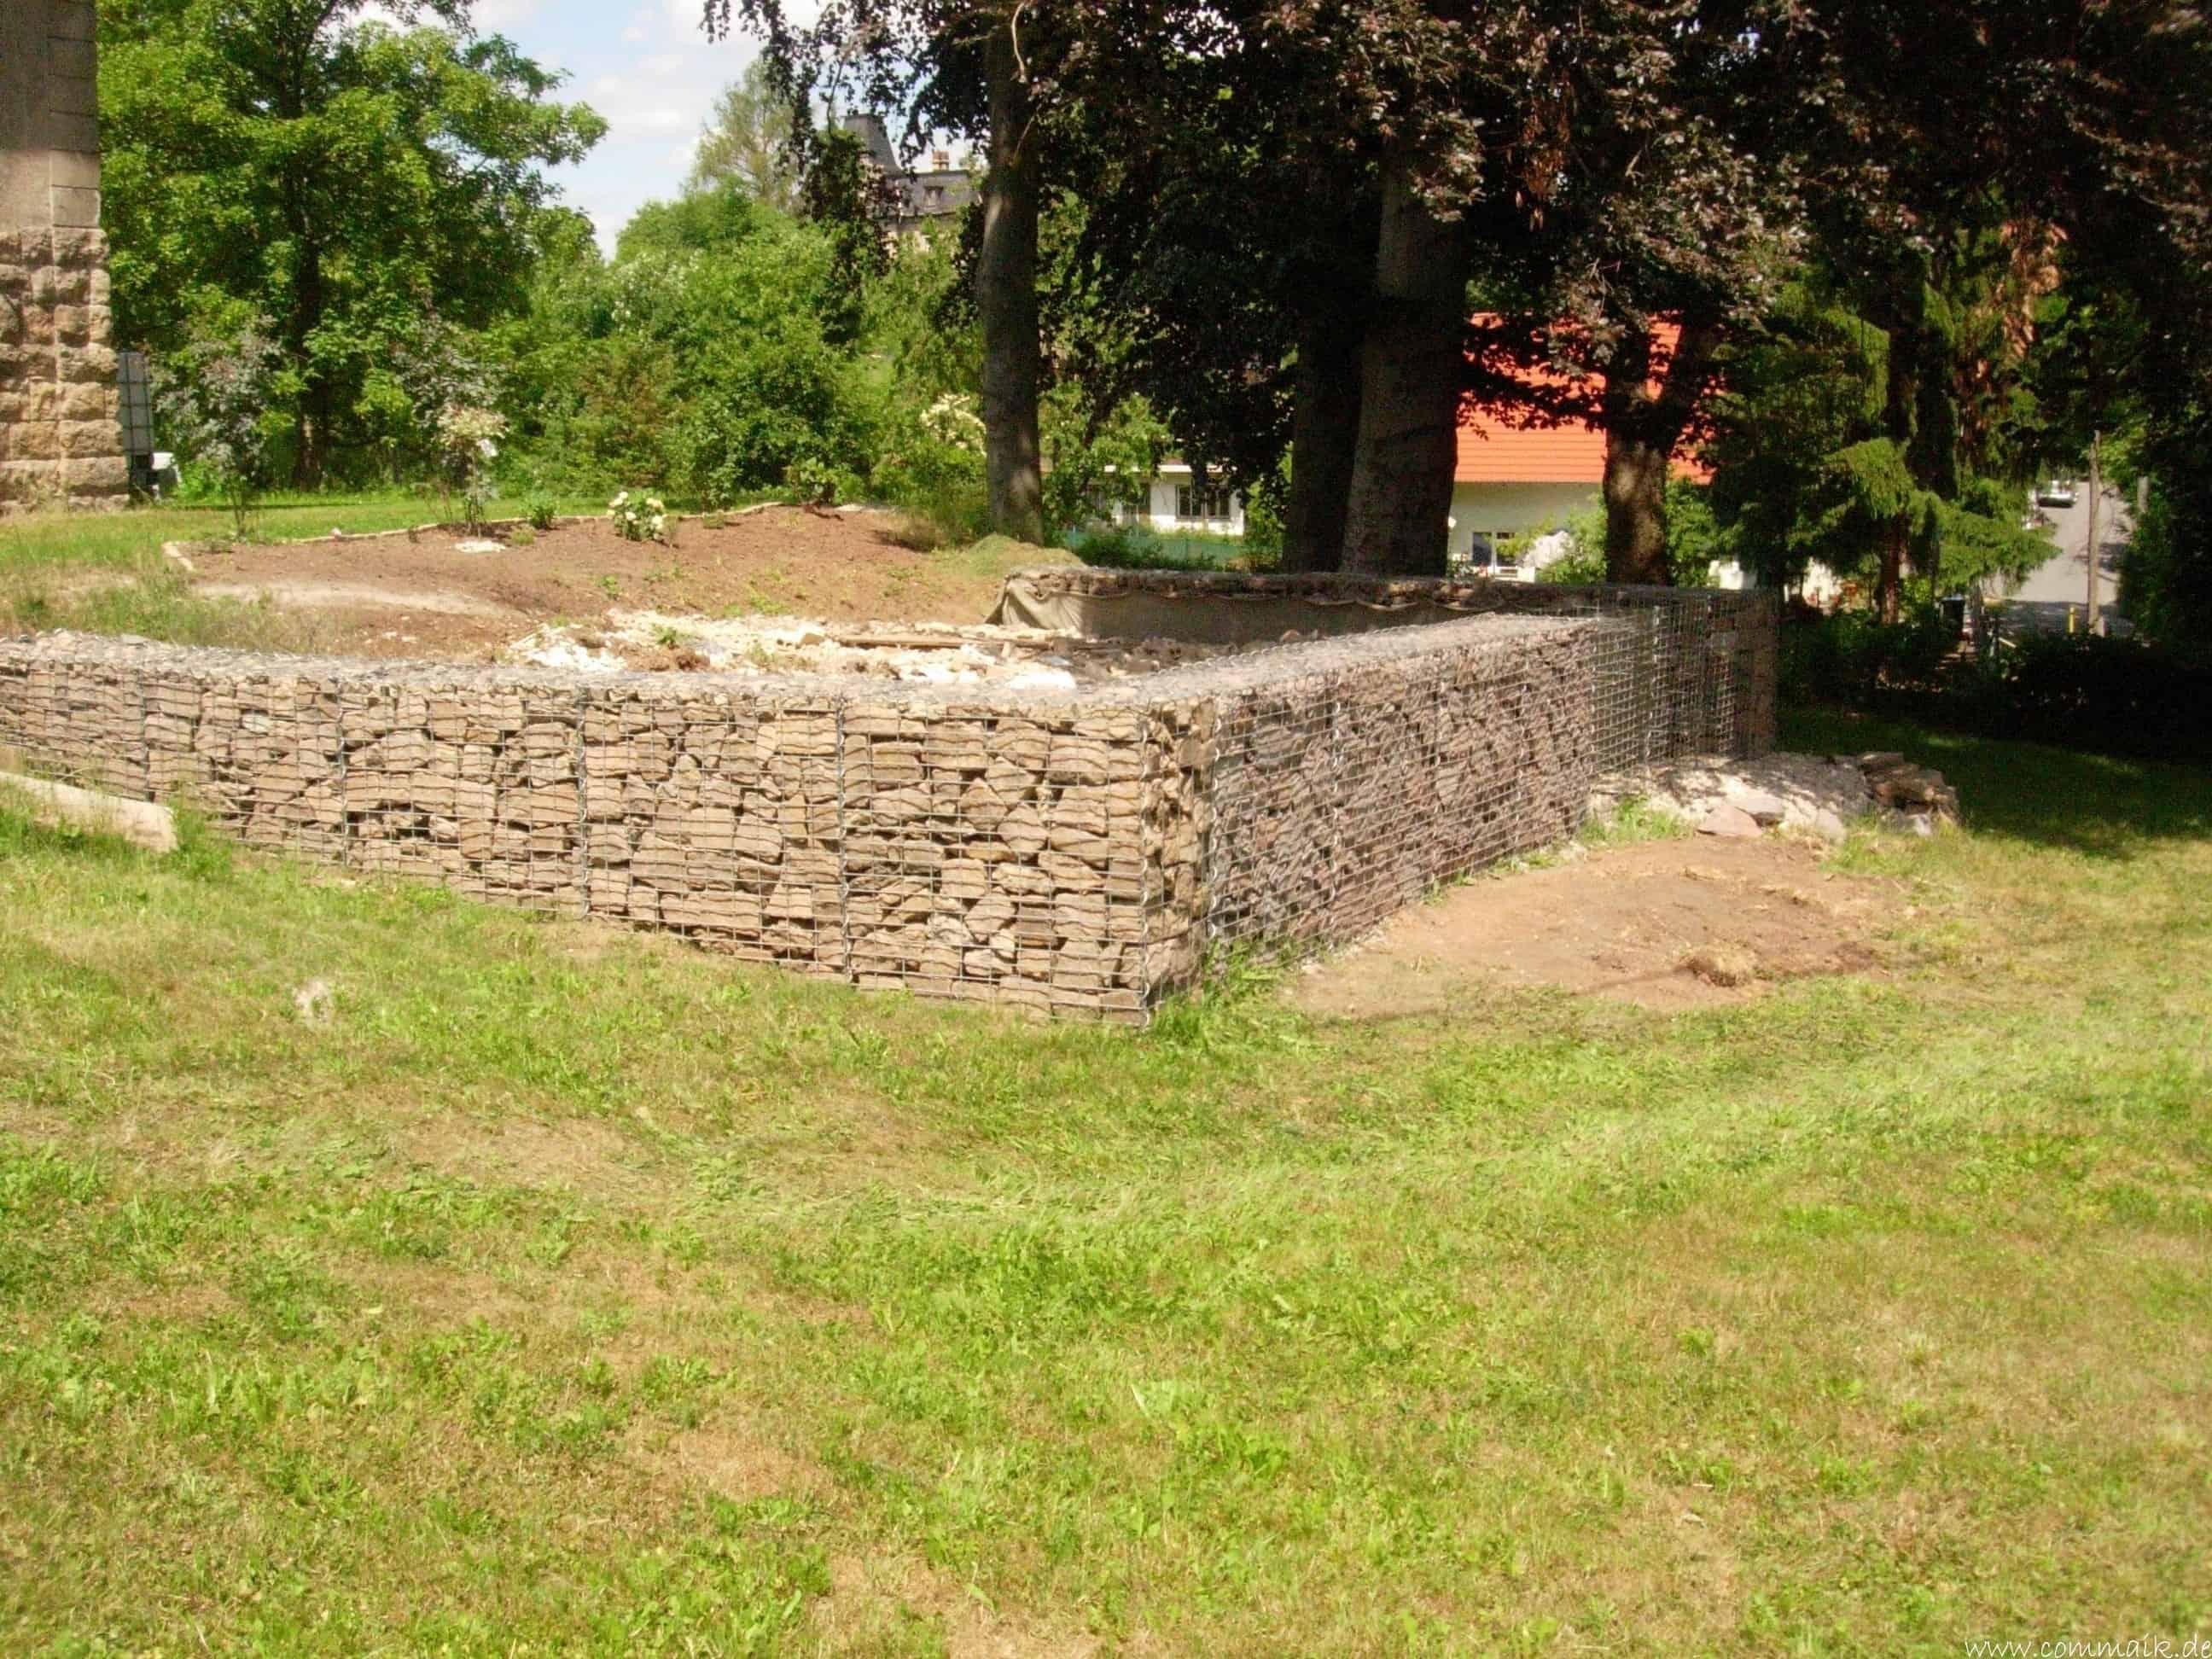 Berühmt Der Bau unserer Gabionen Terrasse zum Abfang des Hangs | commaik HR03